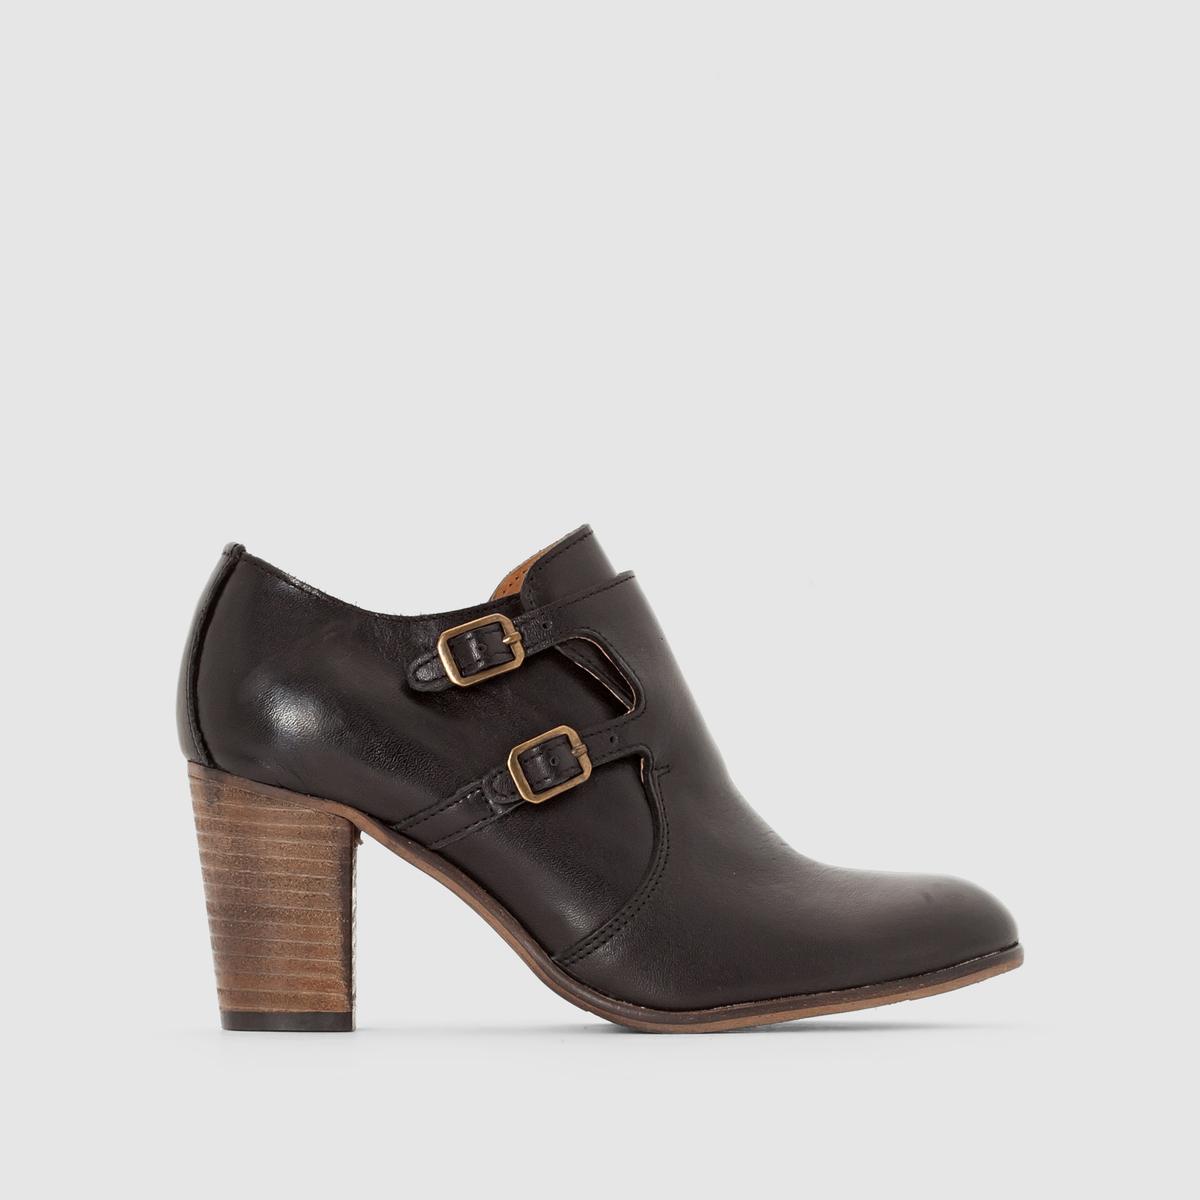 Ботинки-дерби кожаные на каблуке и с клапаном Dailymoc